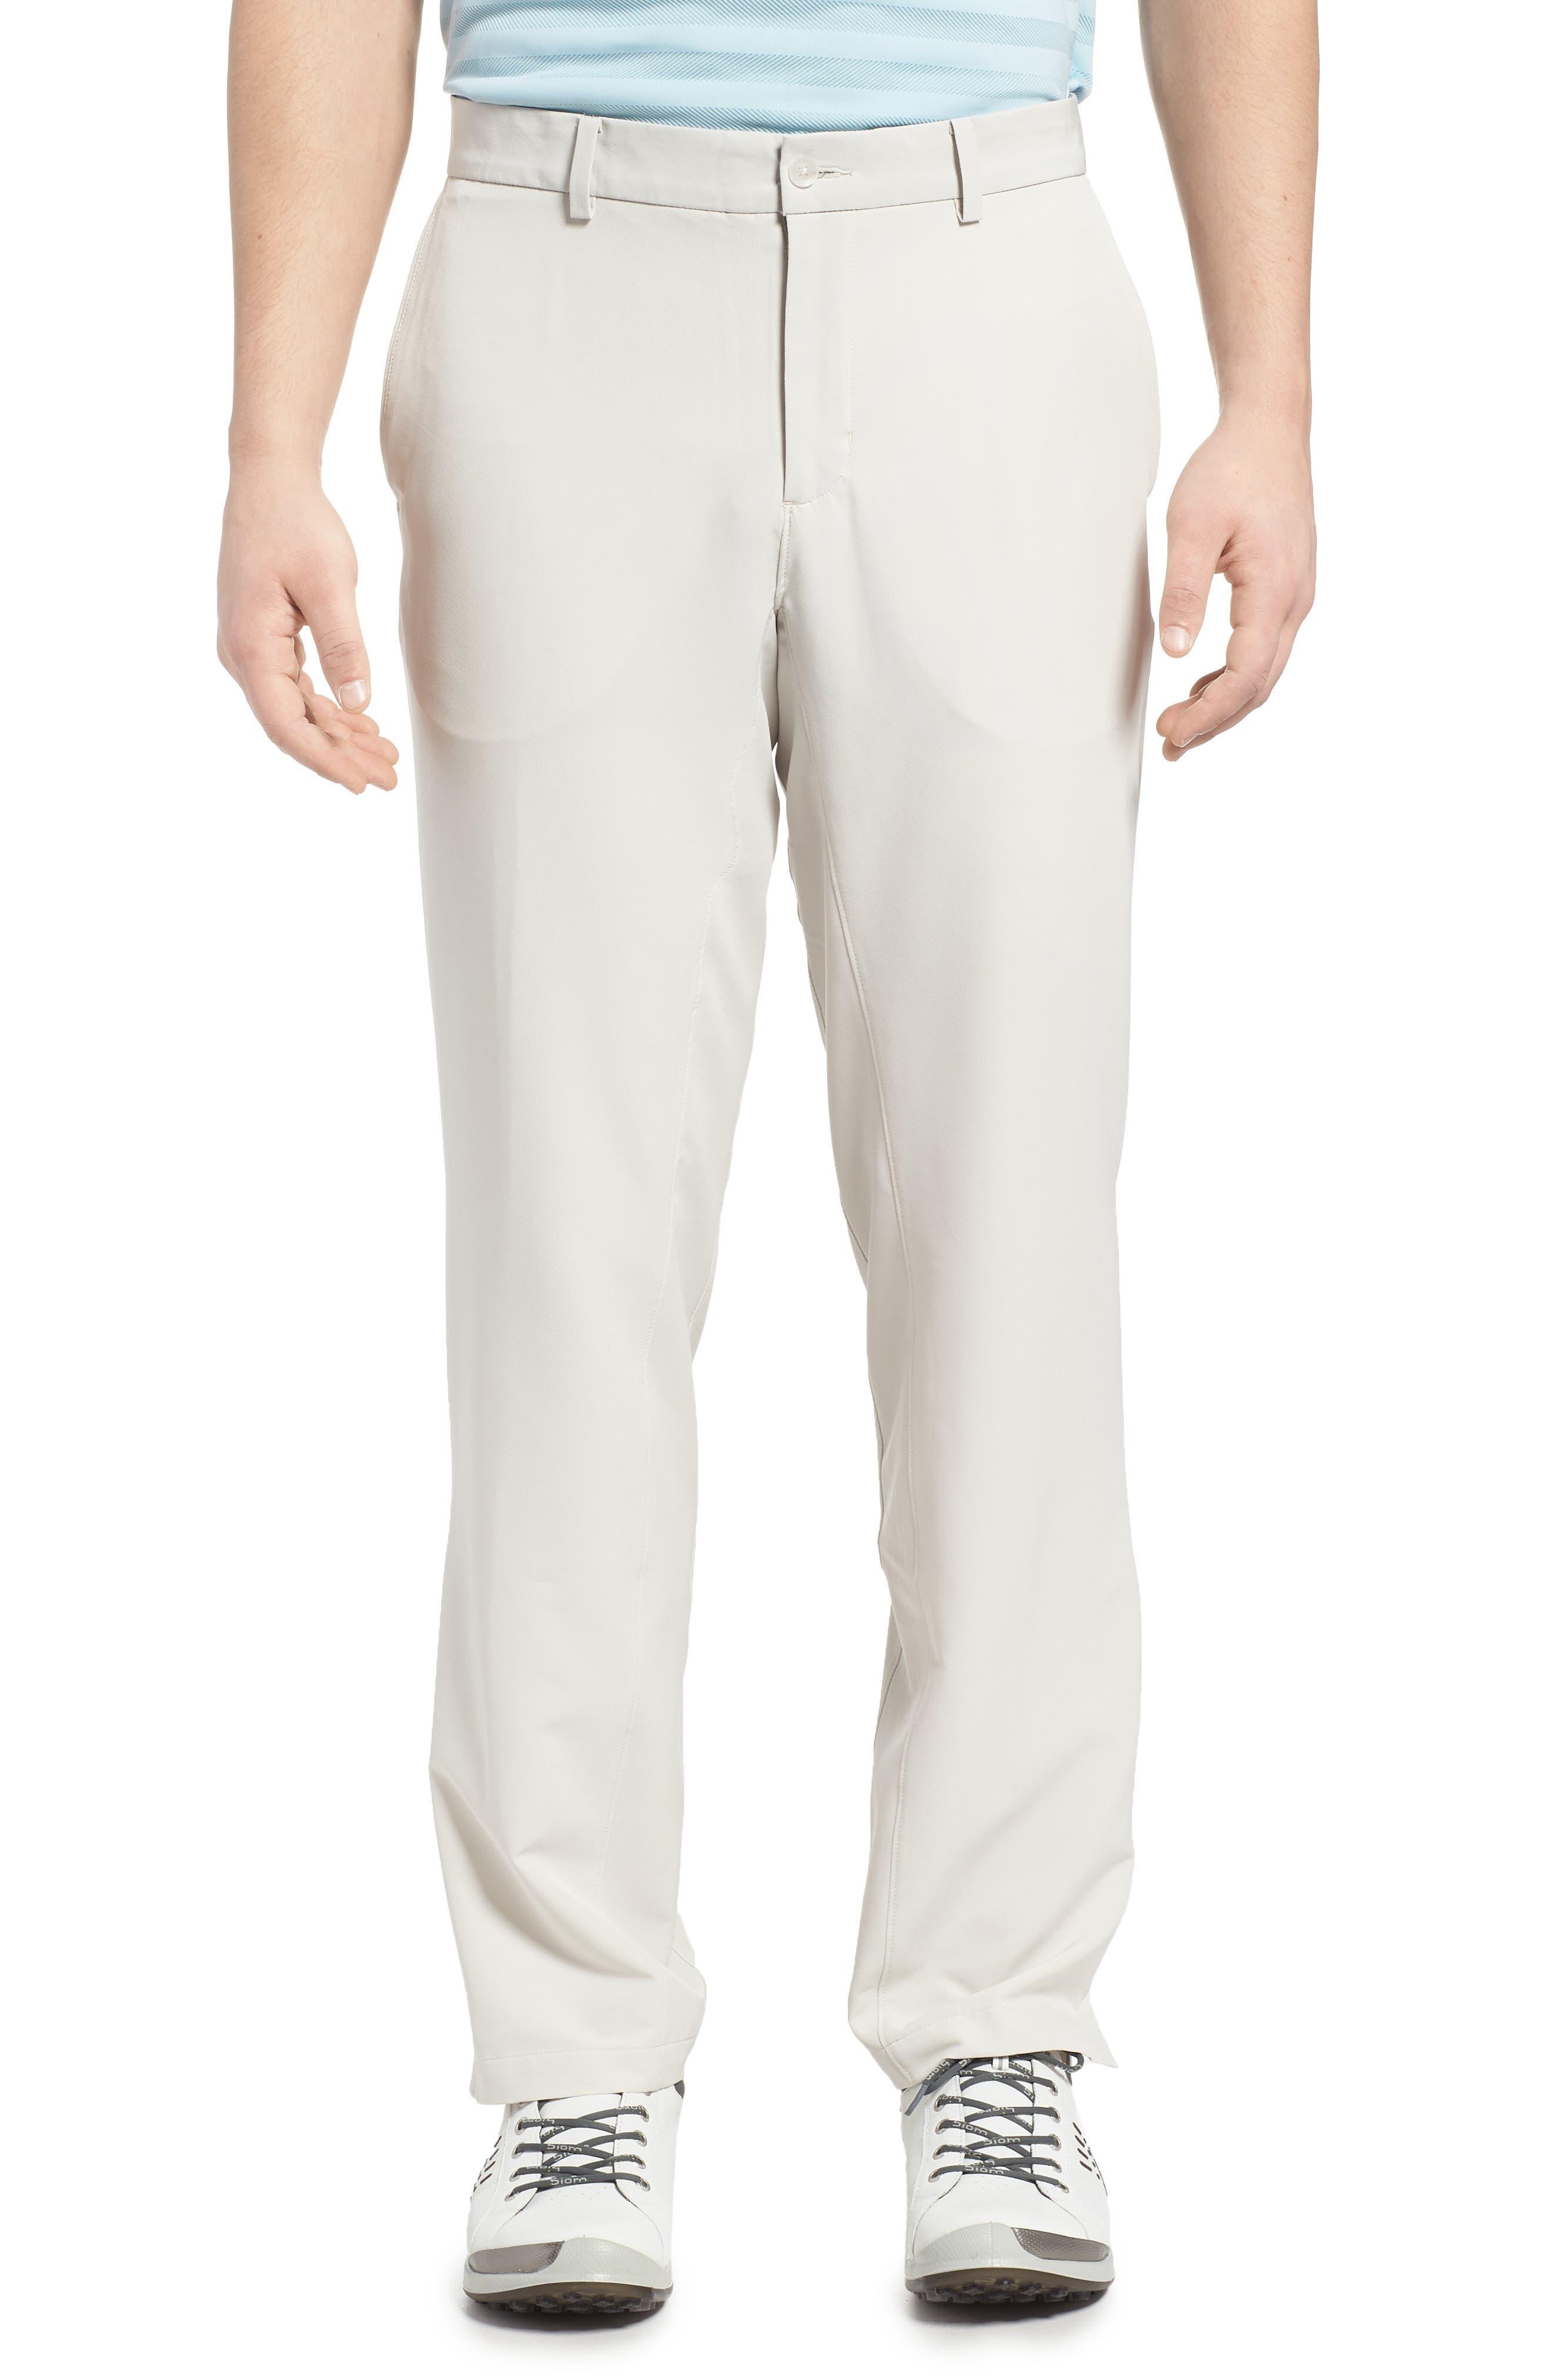 Hybrid Flex Golf Pants,                         Main,                         color, Light Bone/ Light Bone